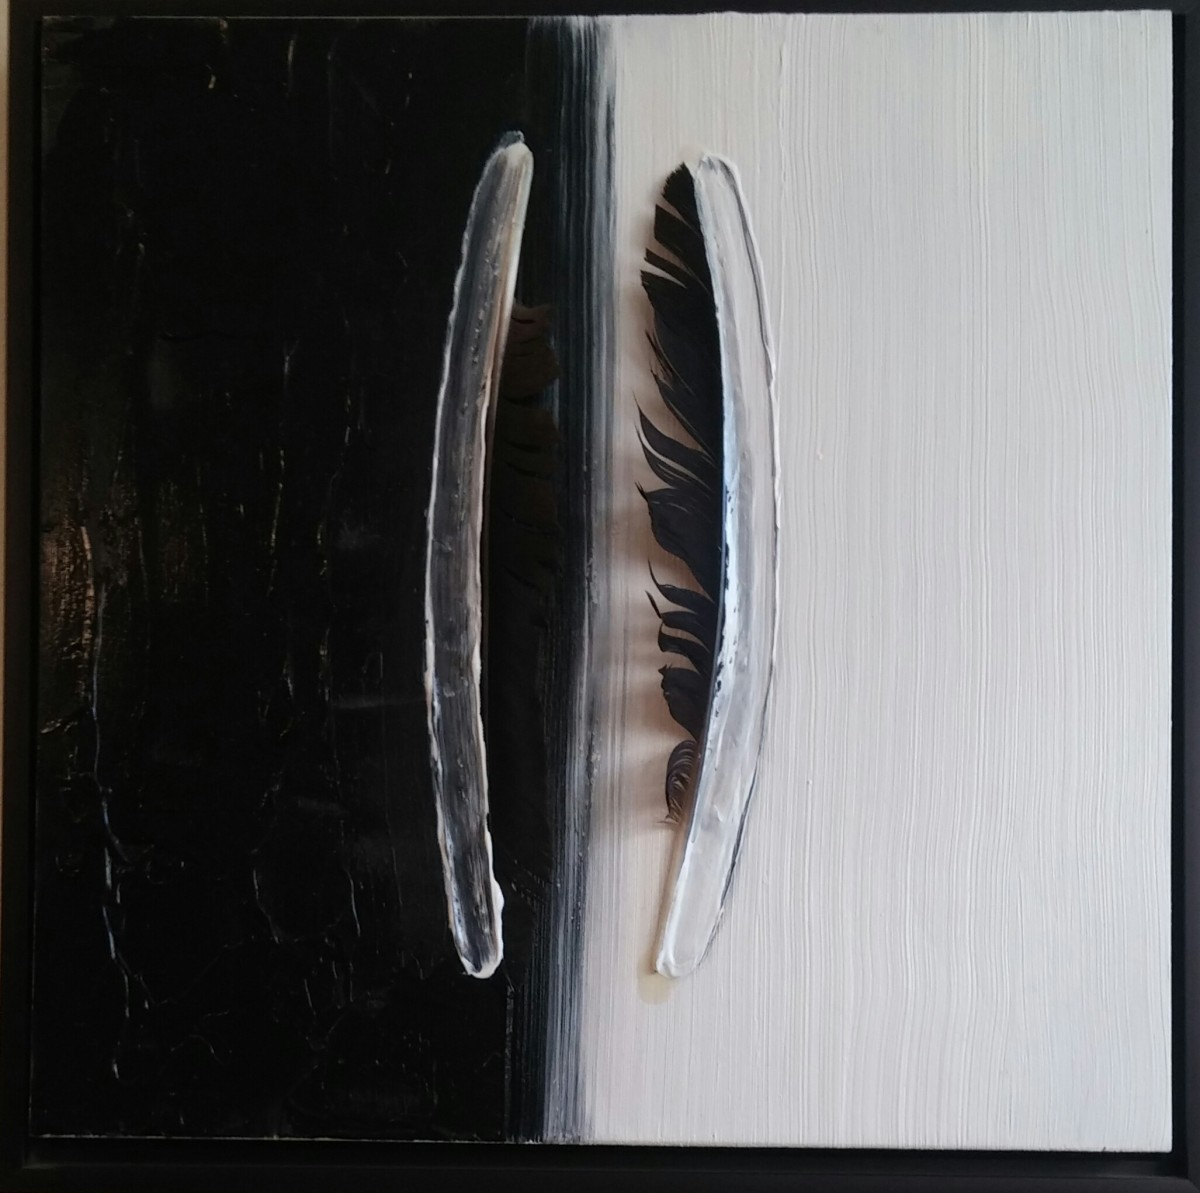 Crow Swish Caw Silence by HB Barry Strasbourg-Thompson BFA